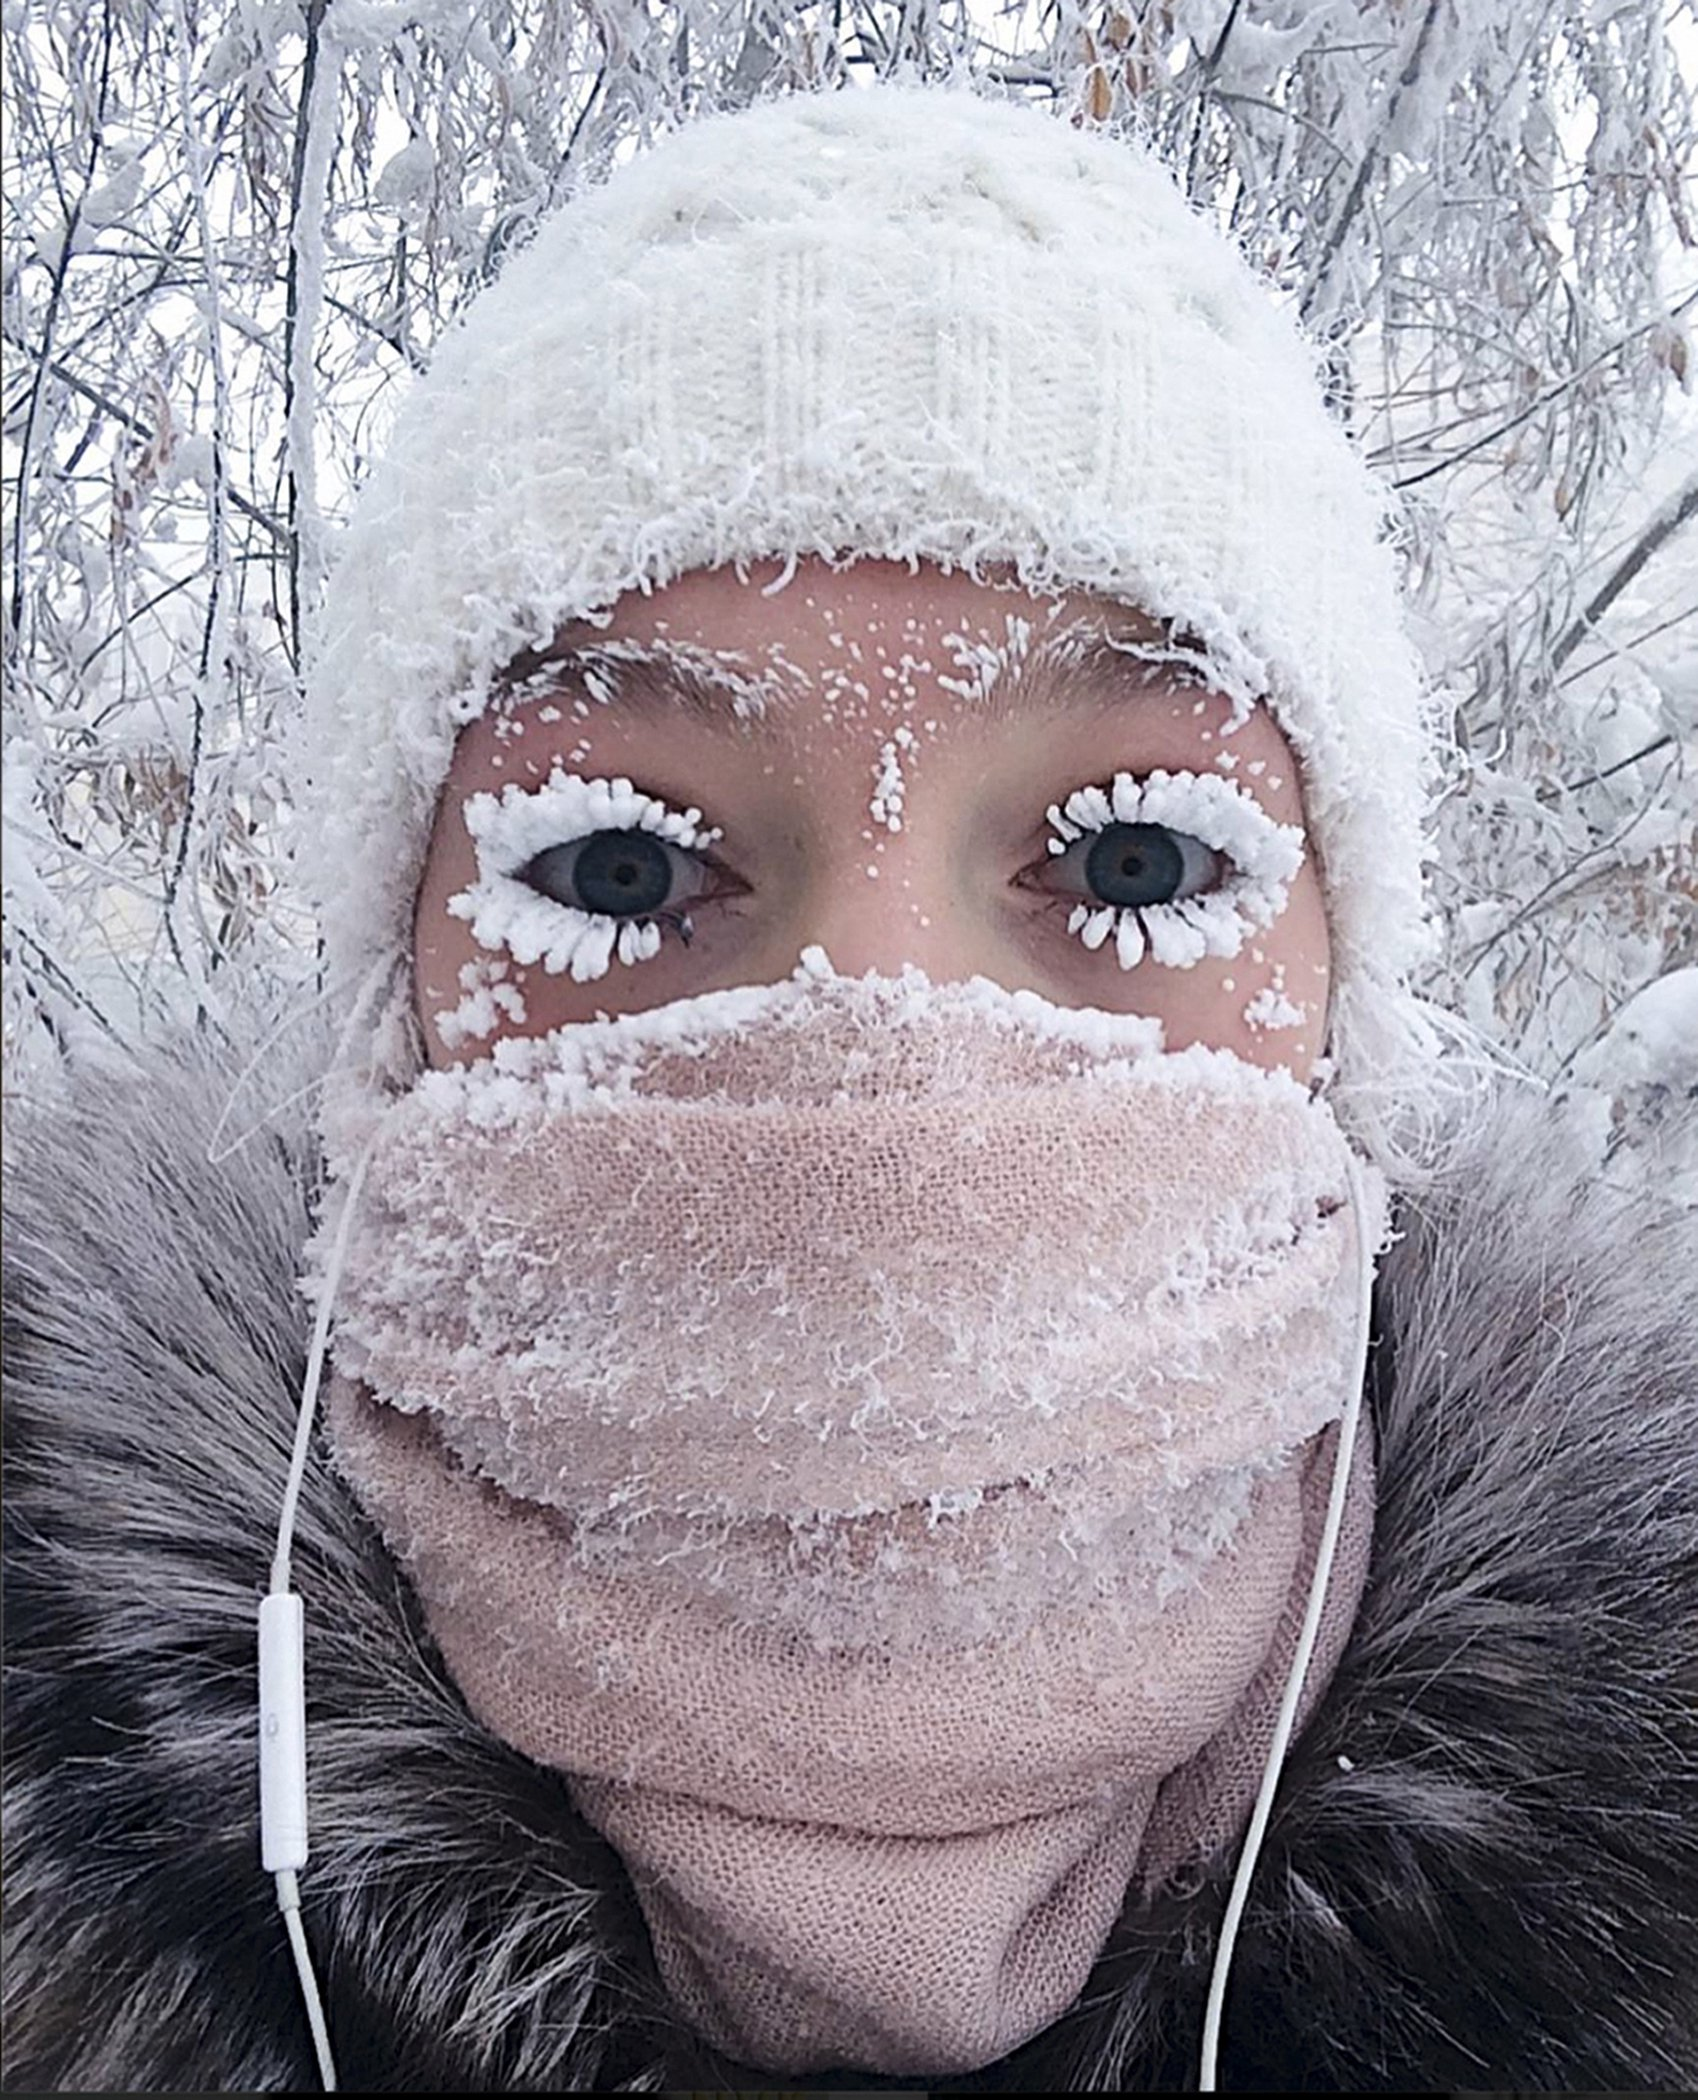 Russia-Siberia-Cold-Freezing.jpg